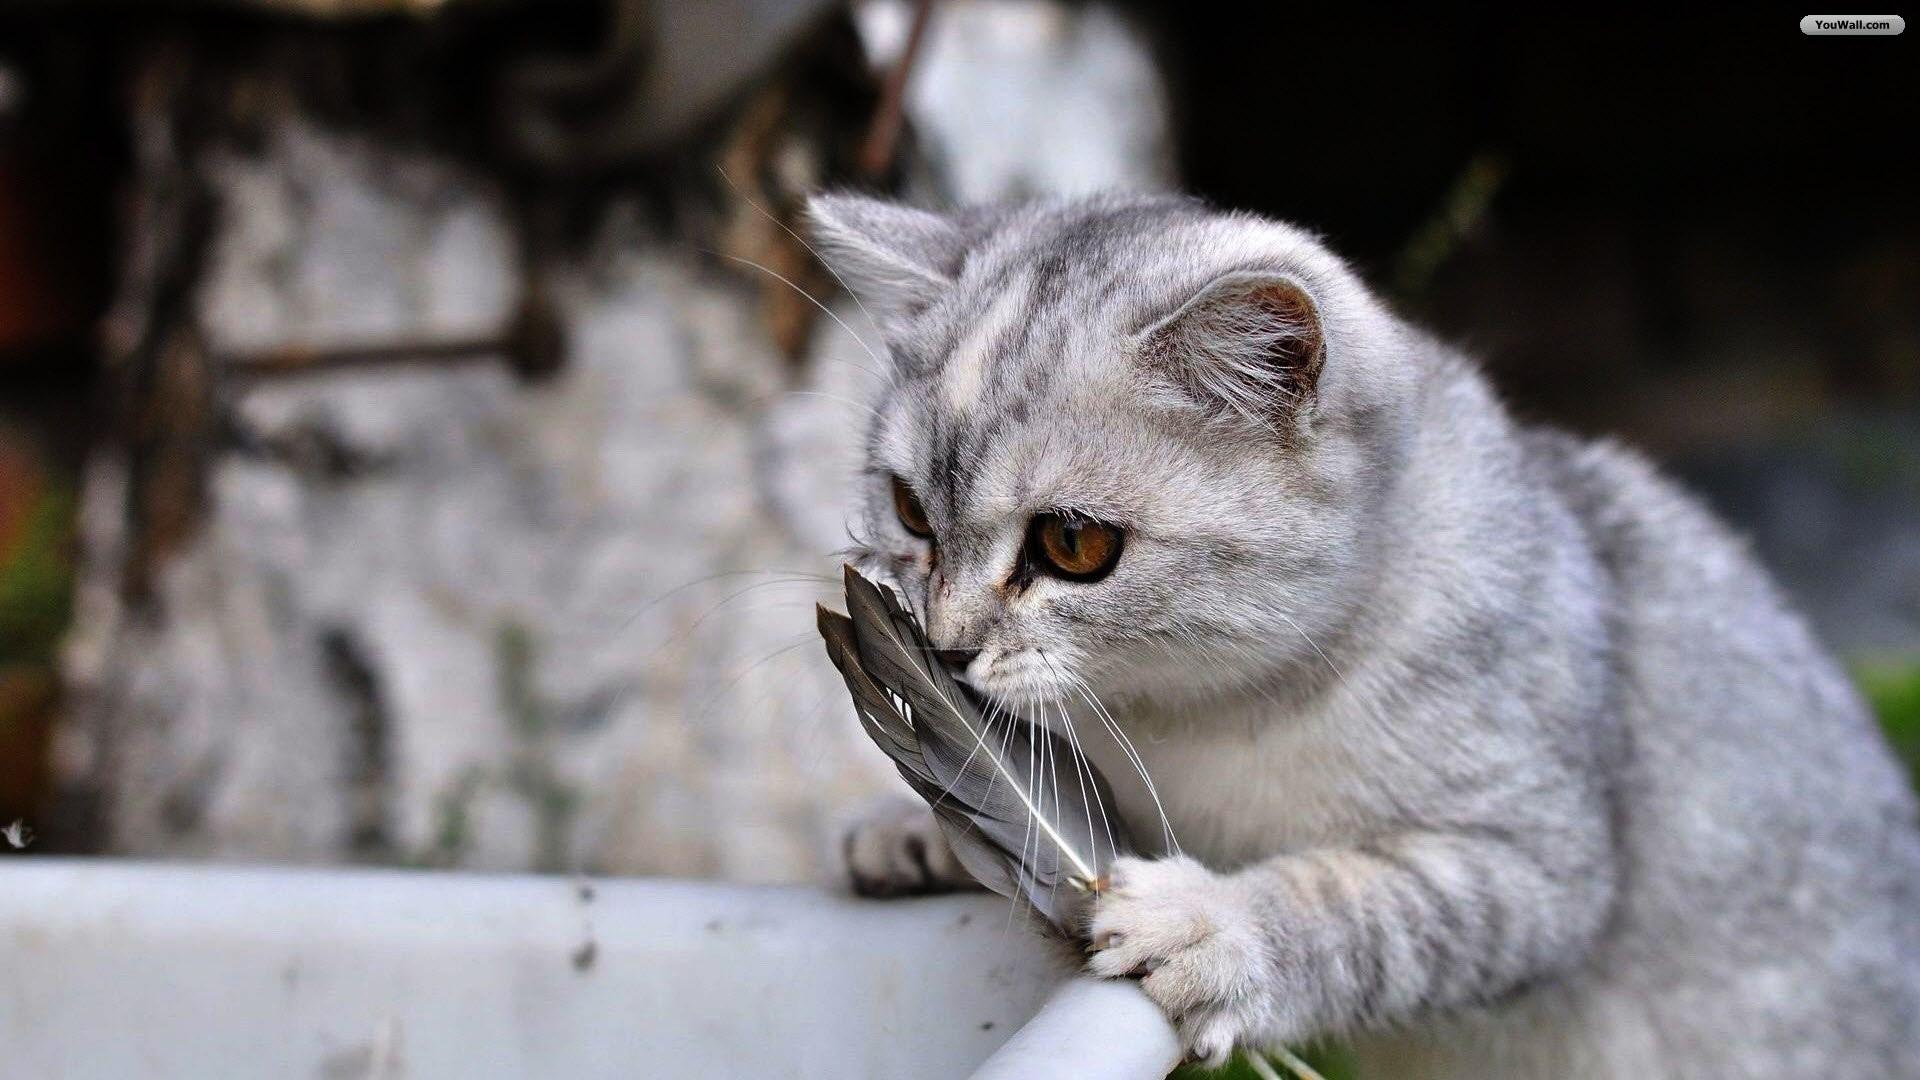 Reading cats computer wallpaper 47 images - Cute kitten wallpaper free download ...